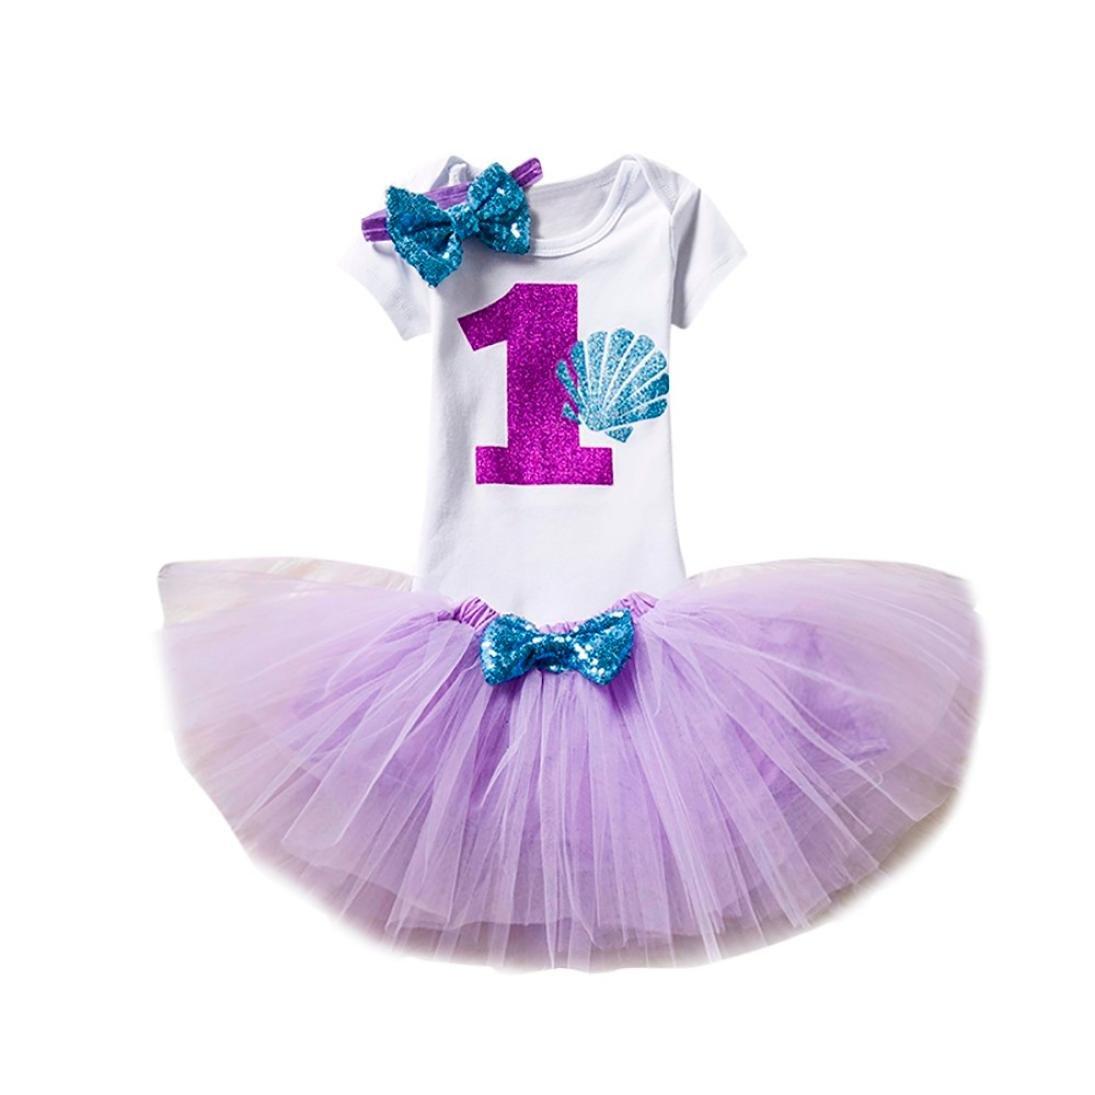 f24bc96d5a Amazon.com: Baby Girls 1 Years Old Birthday Outfits, Cartoon Print Tutu  Skirts+Bodysuit+Headband 3Pcs Set (Purple, 1 Years Old): Clothing